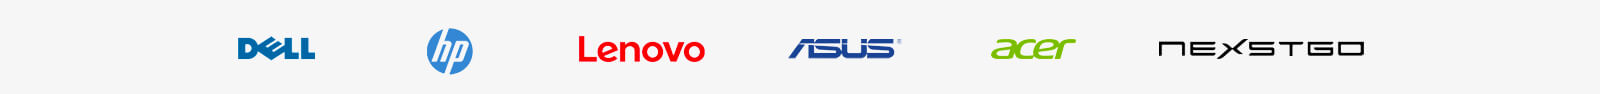 Foxit OEM Partner Logos